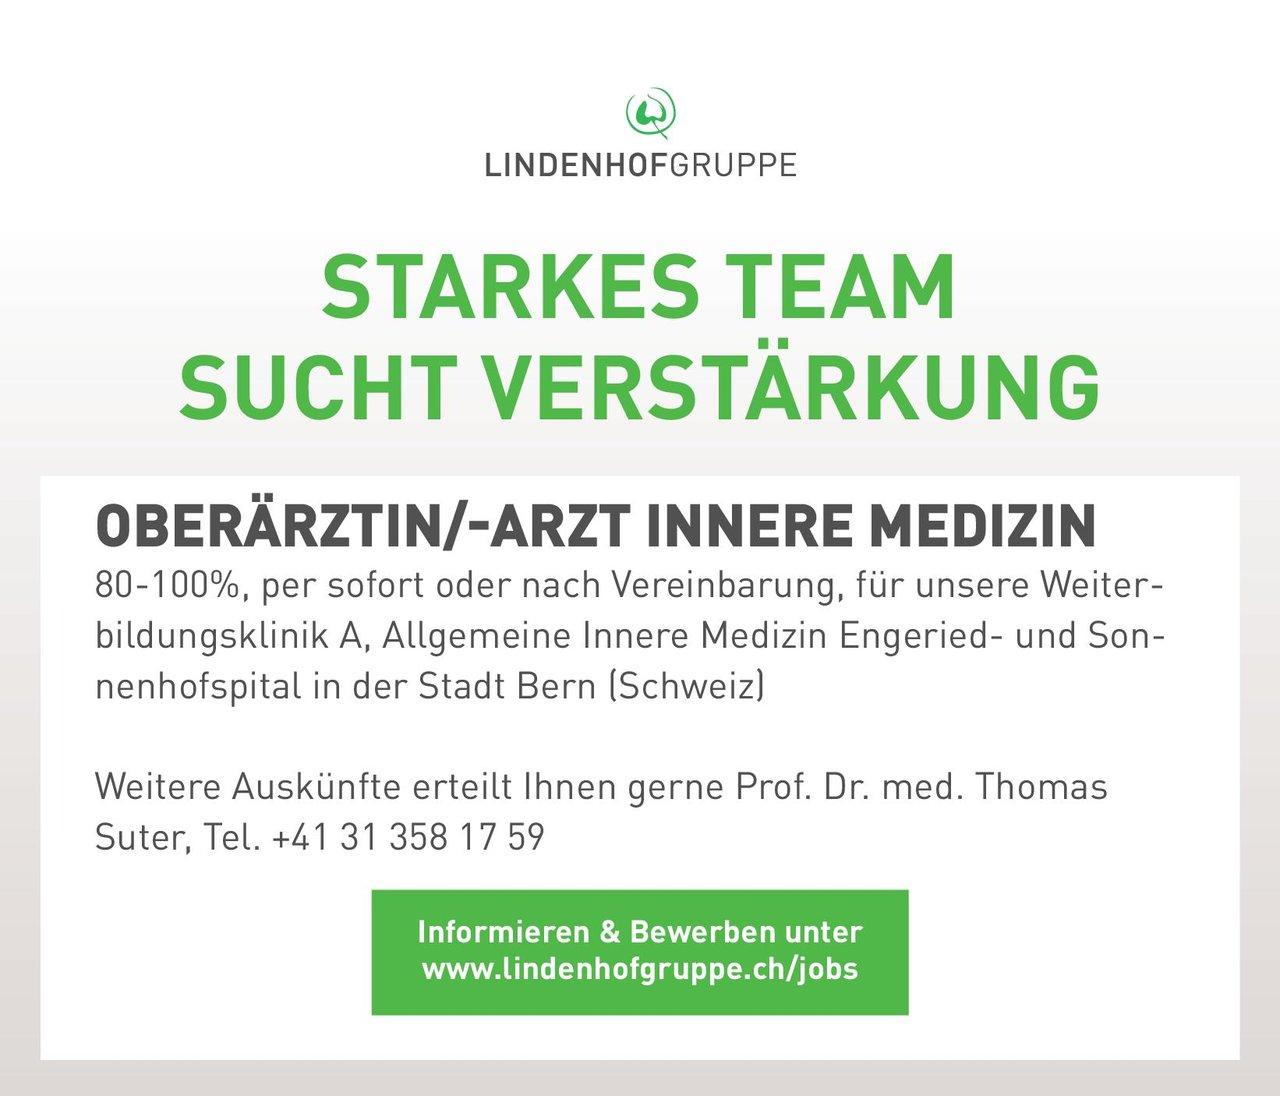 Lindenhofgruppe Oberärztin/-arzt Innere Medizin  Innere Medizin, Innere Medizin Oberarzt